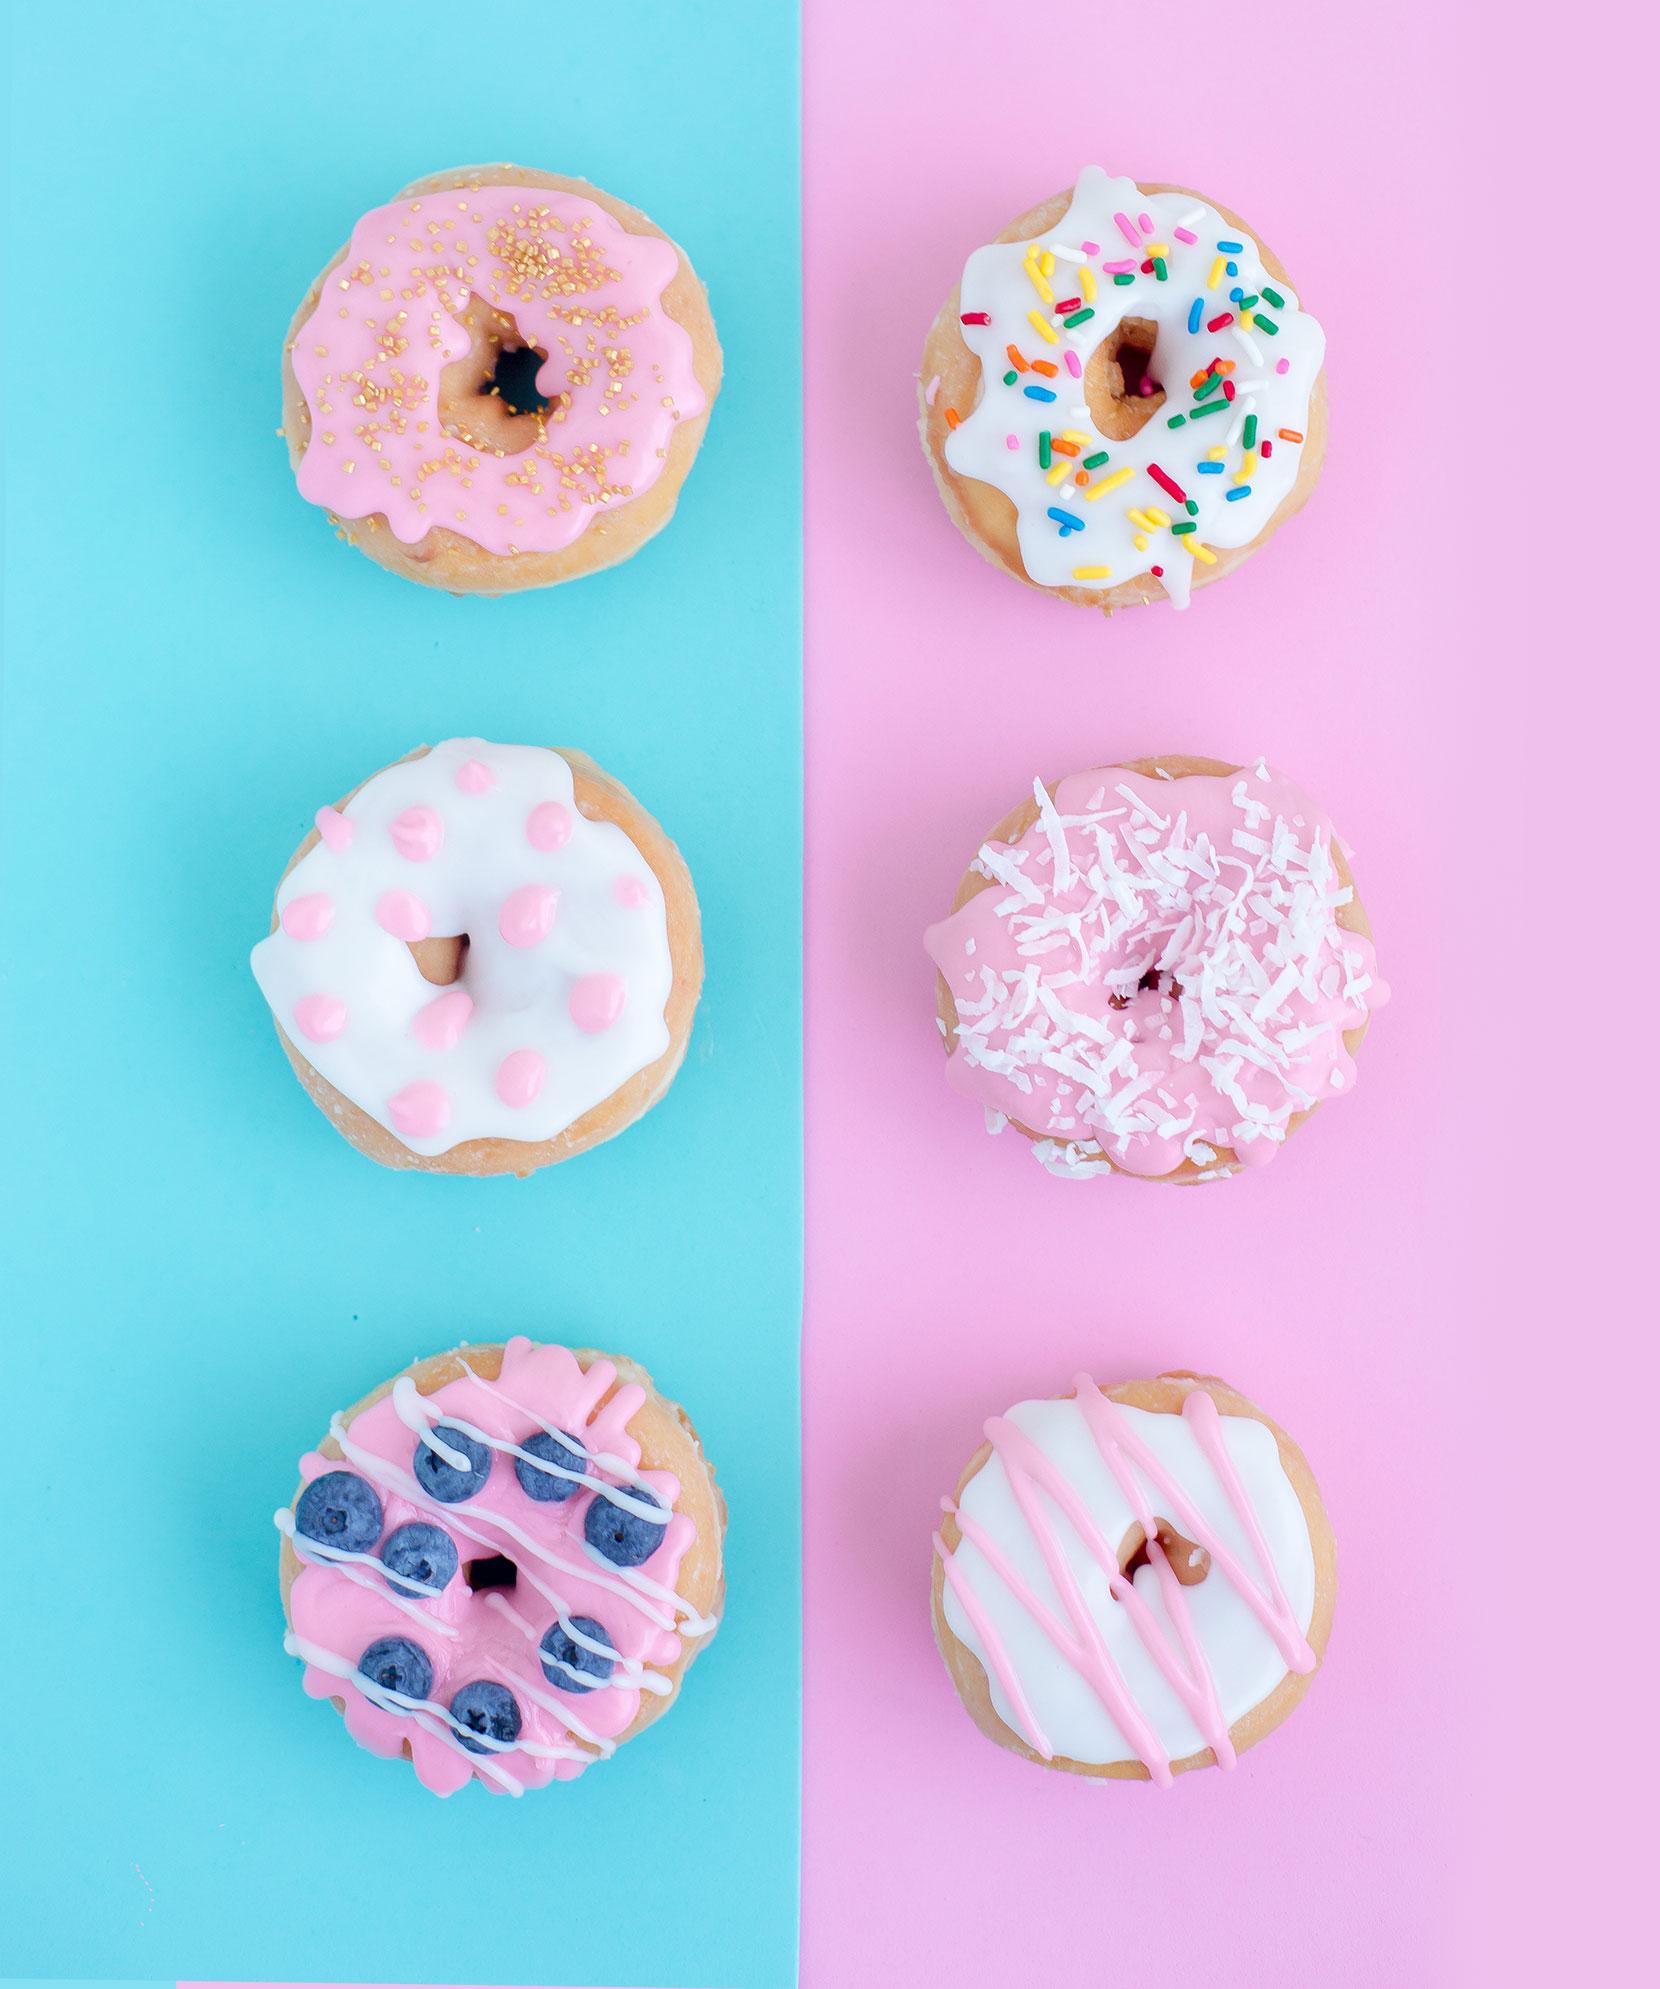 Colors in doughnuts